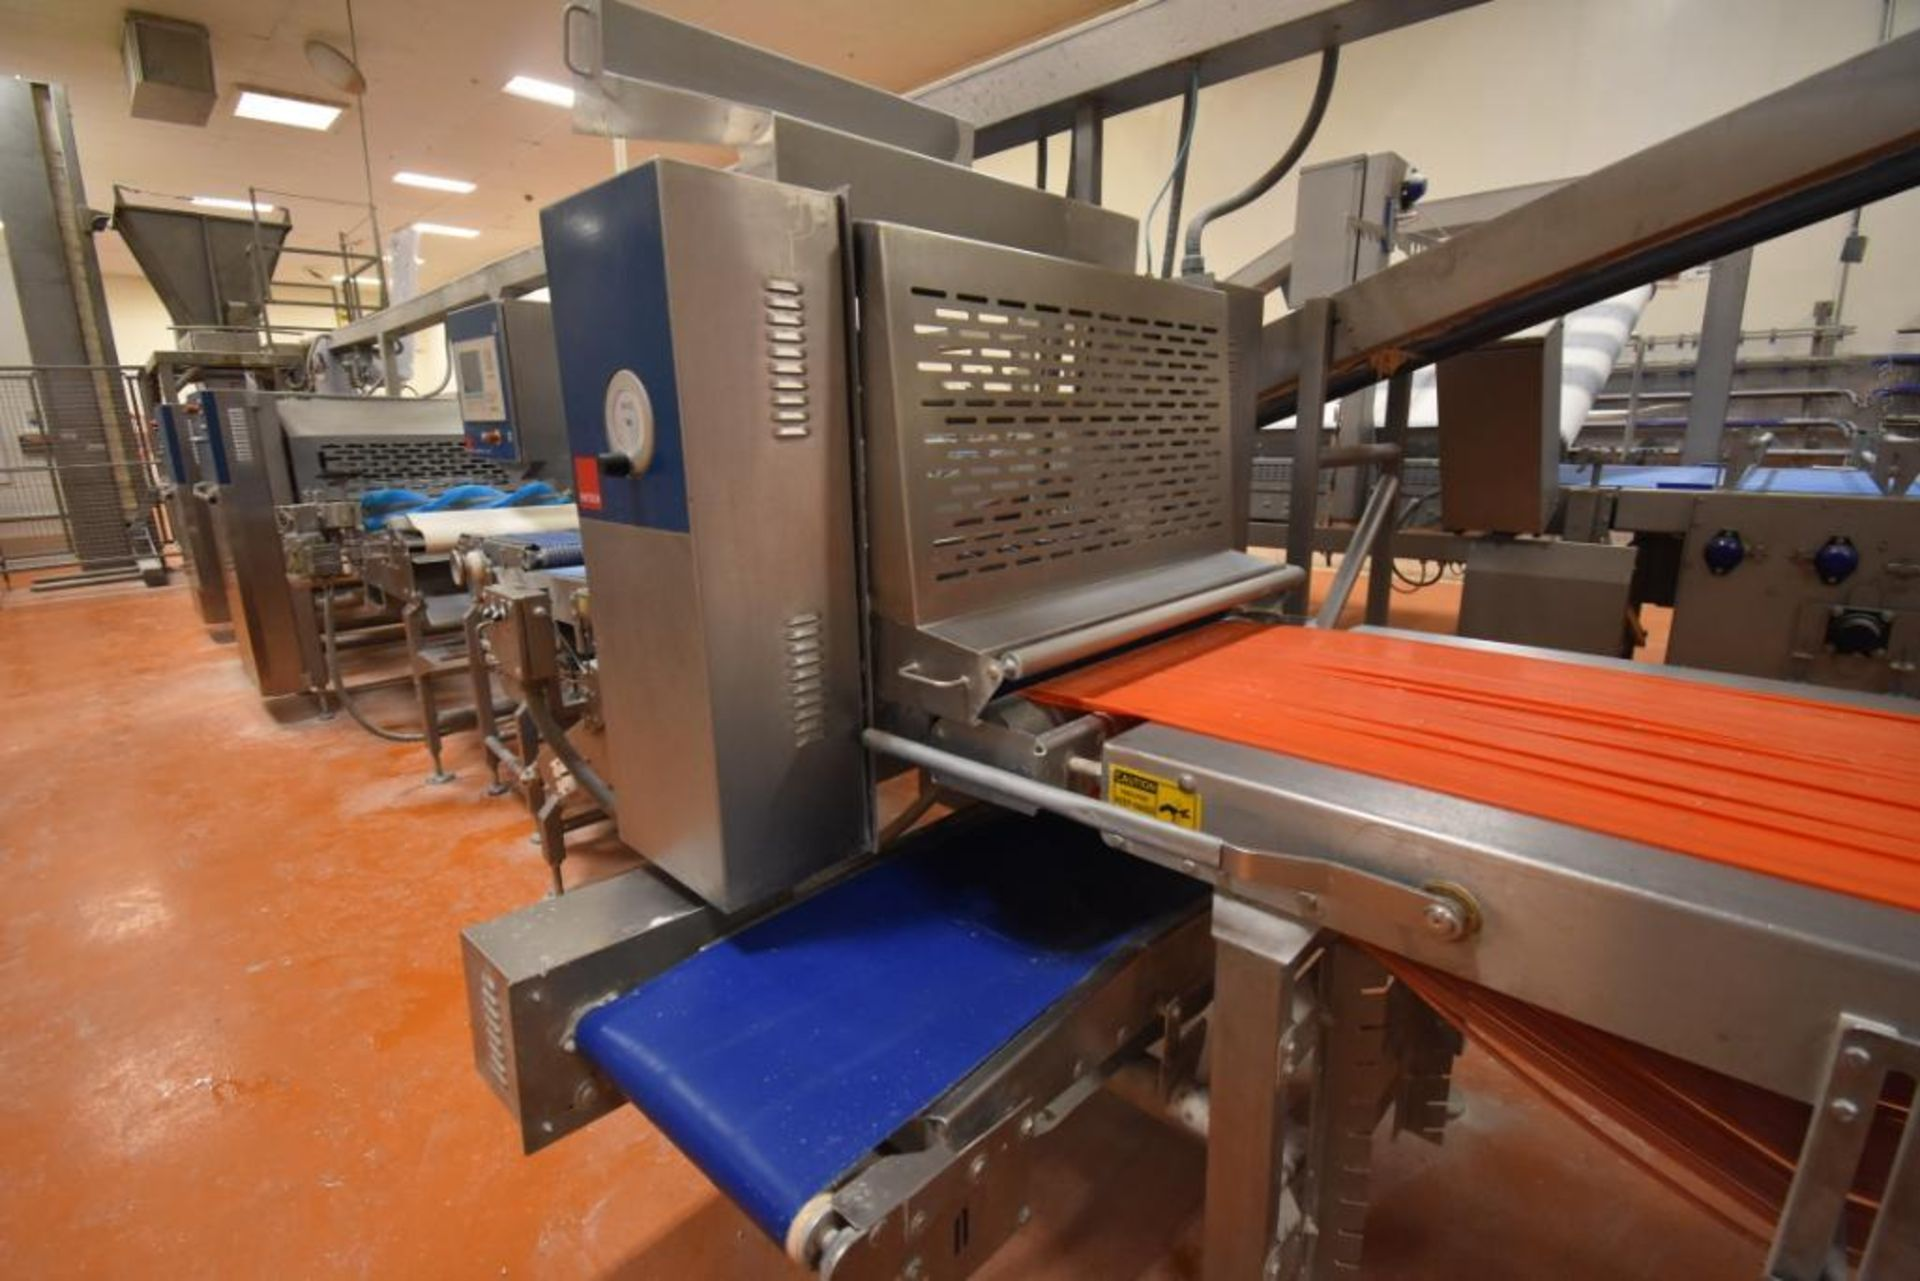 2007 Fritsch Laminator 3000 dough line - Image 99 of 280